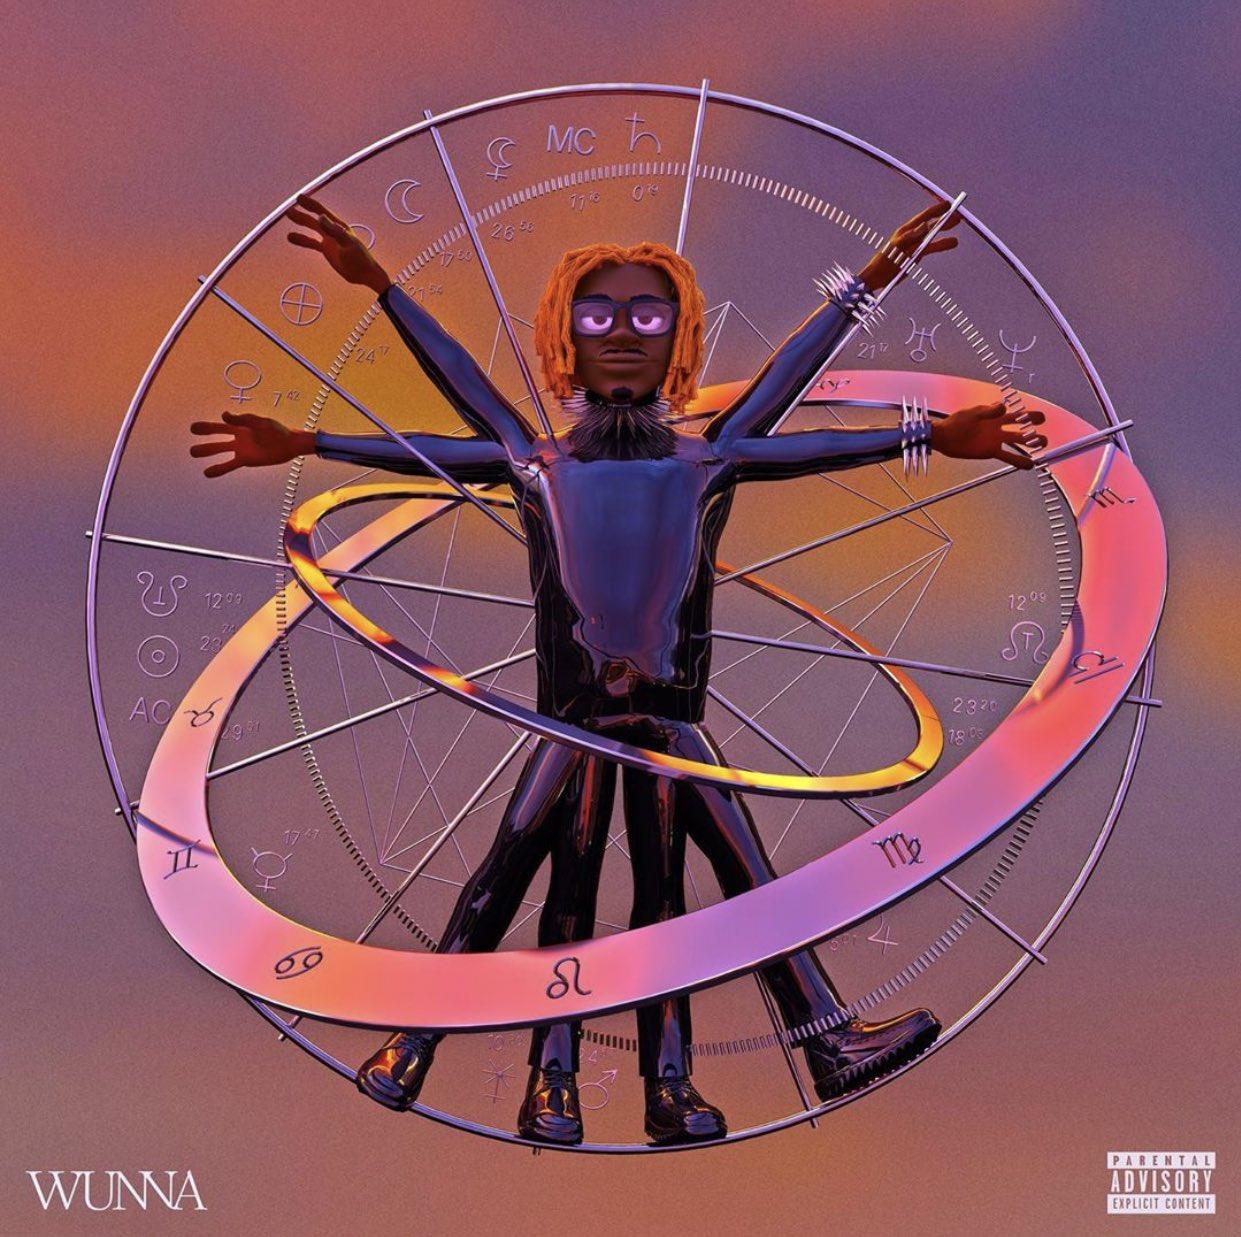 Gunna – 'Wunna' (Album Stream/Documentary)